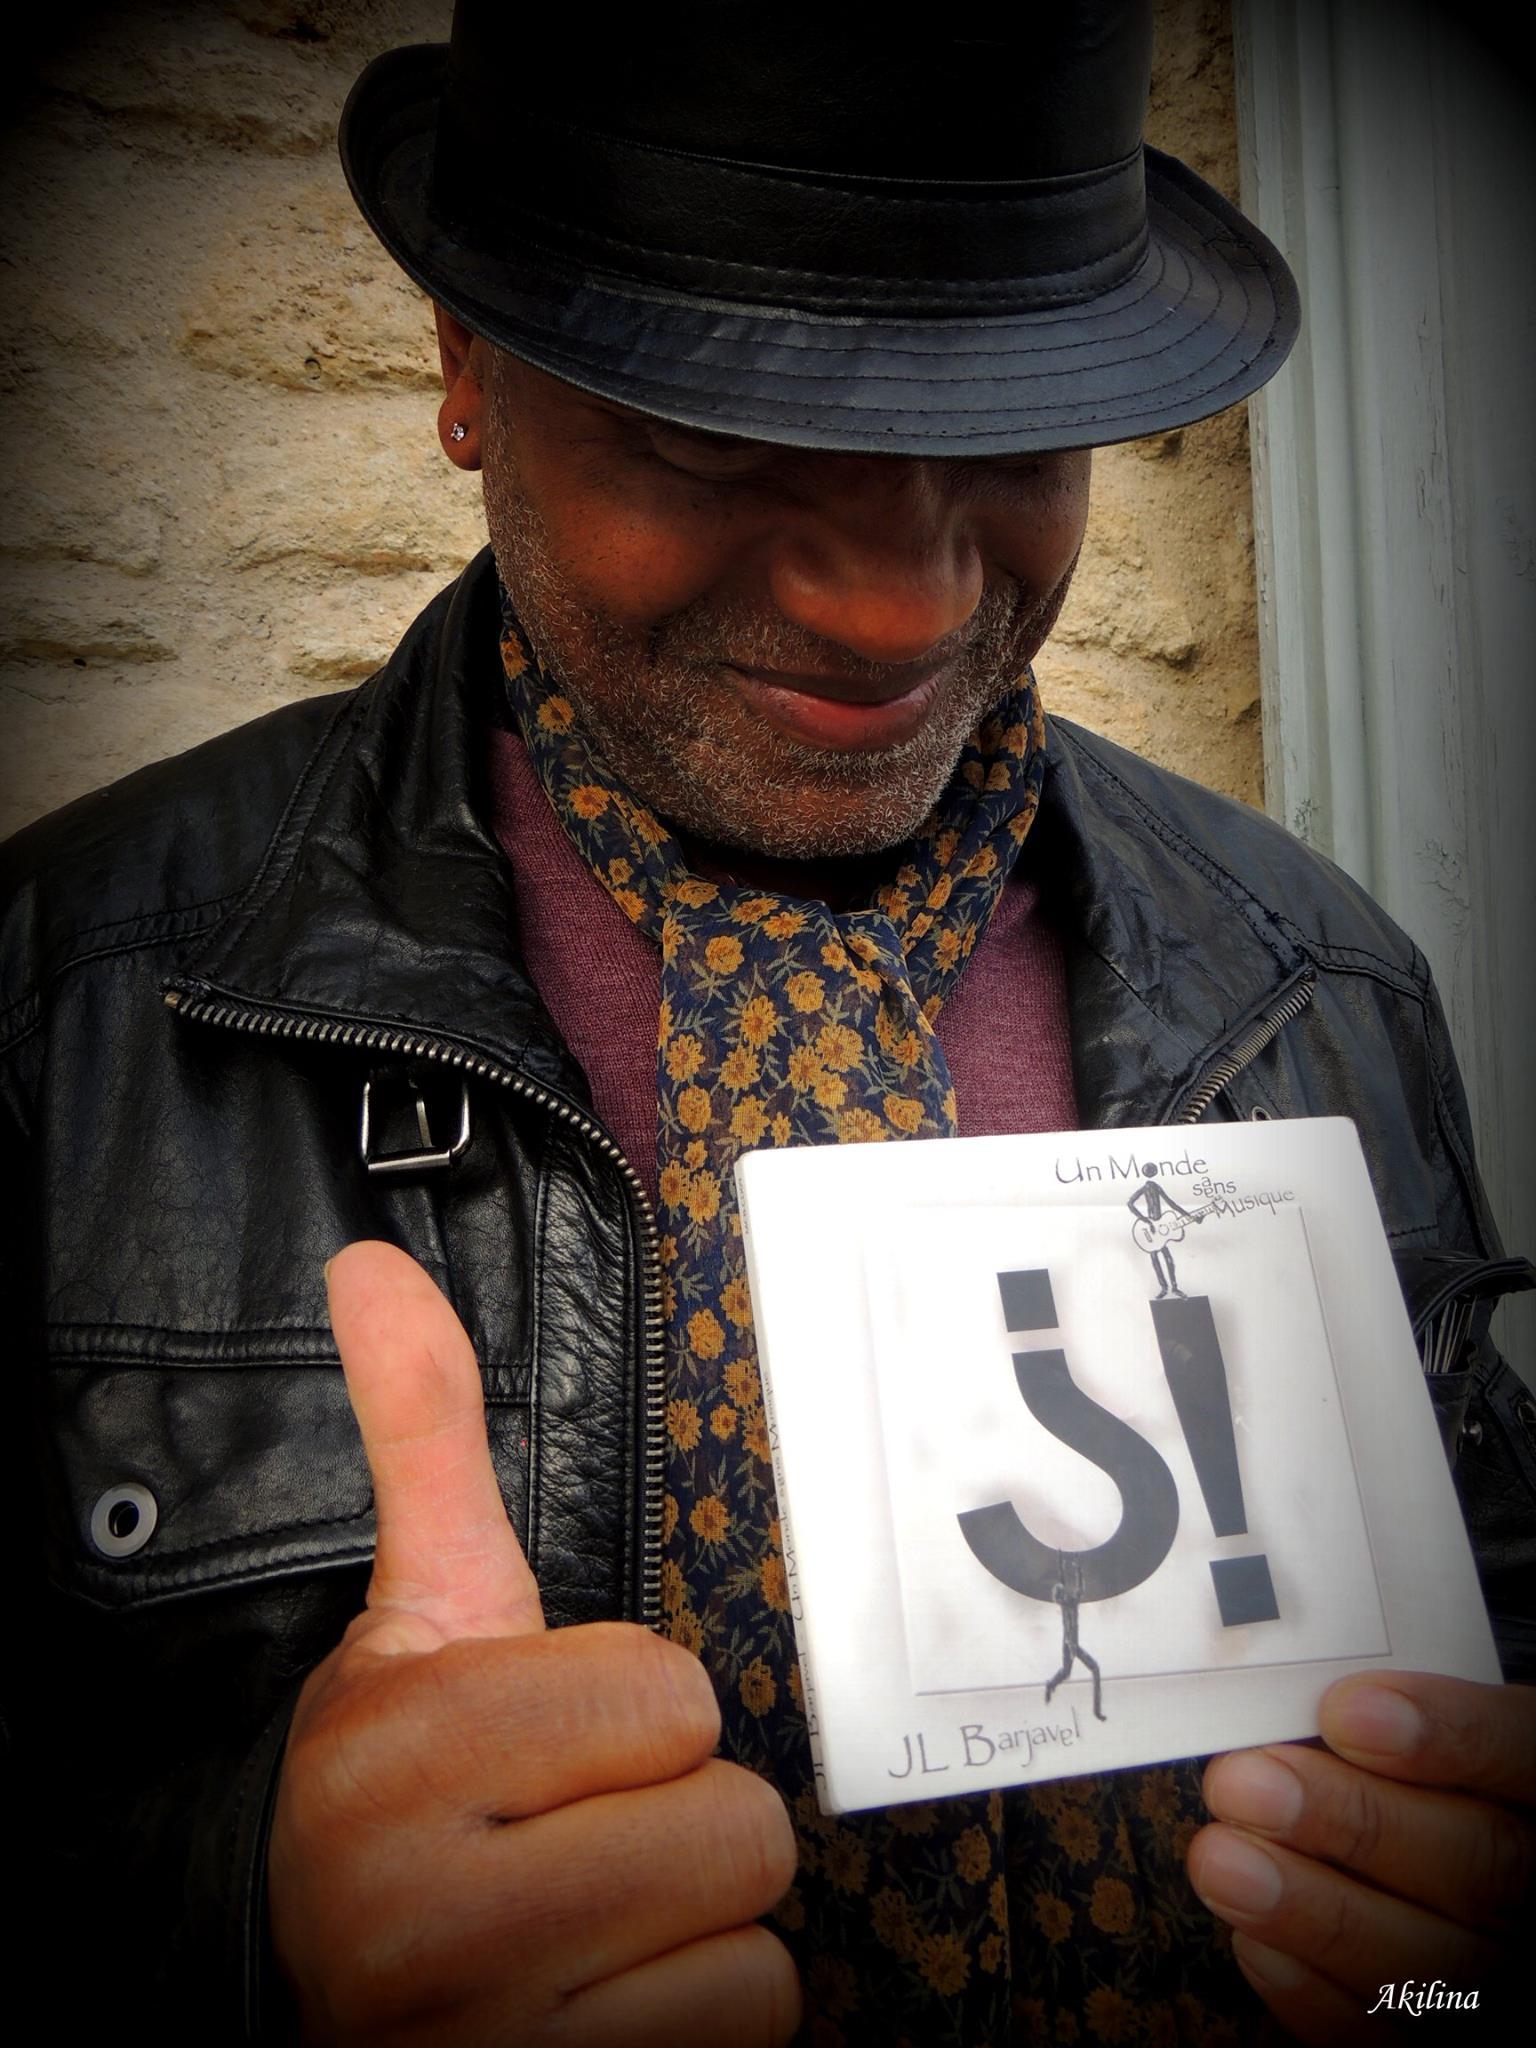 JL Album by Sylvia 181.jpg